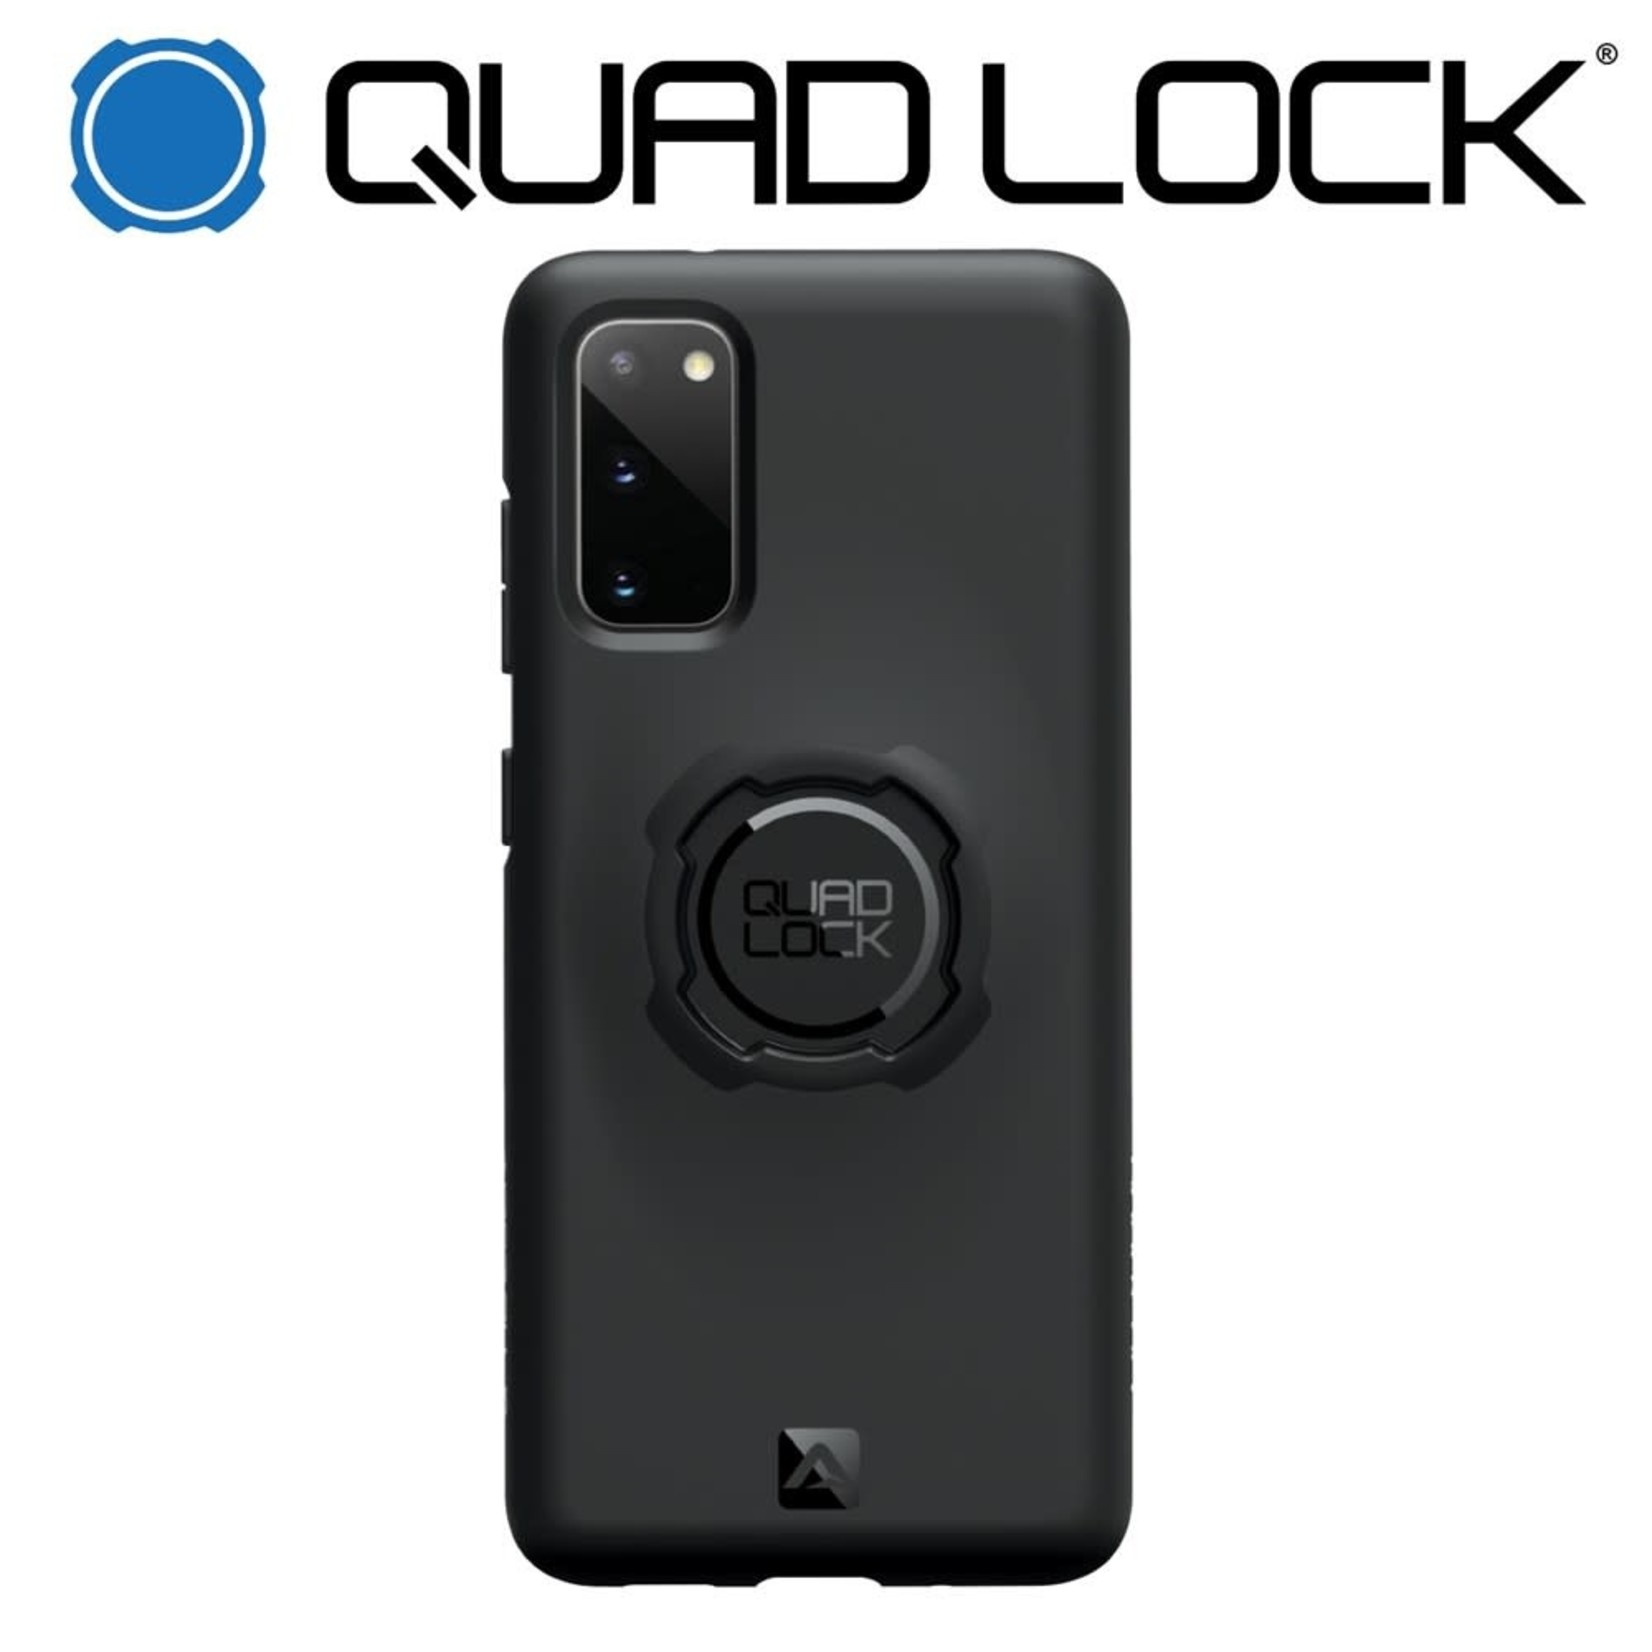 Quad Lock Samsung Galaxy S21 Case